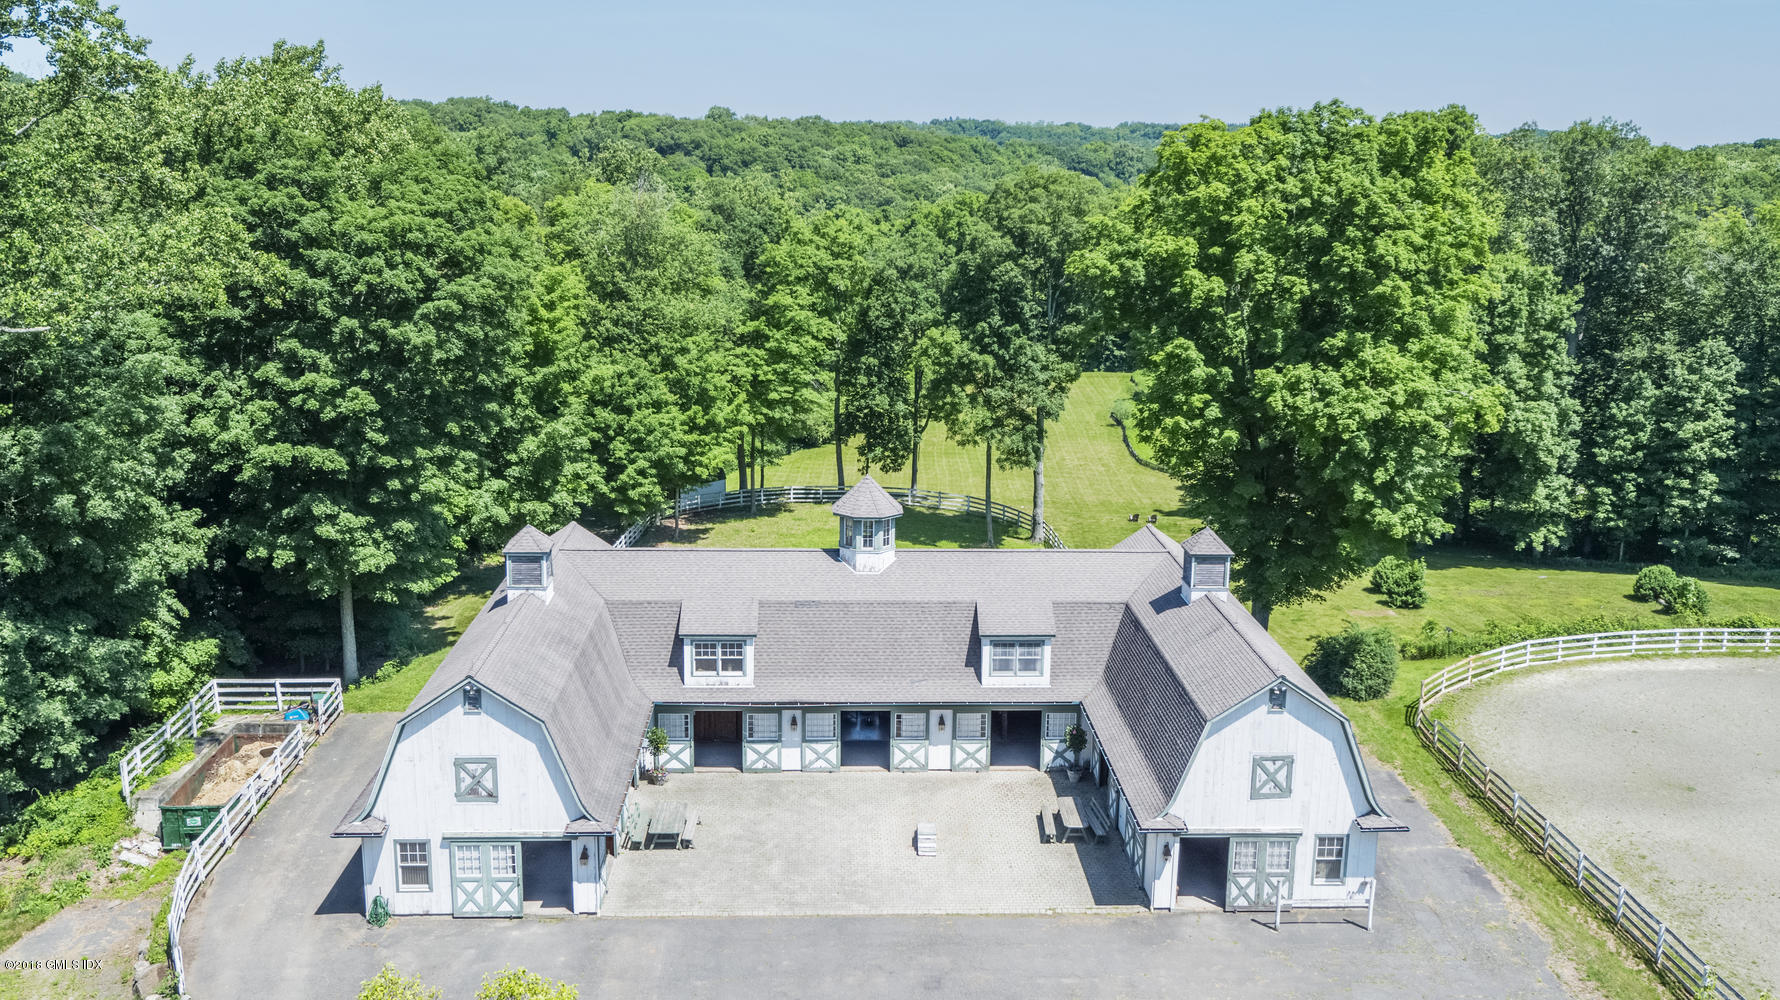 50 Lafrentz - Lot 3 Road,Greenwich,Connecticut 06831,3 Bedrooms Bedrooms,2 BathroomsBathrooms,Lafrentz - Lot 3,103650